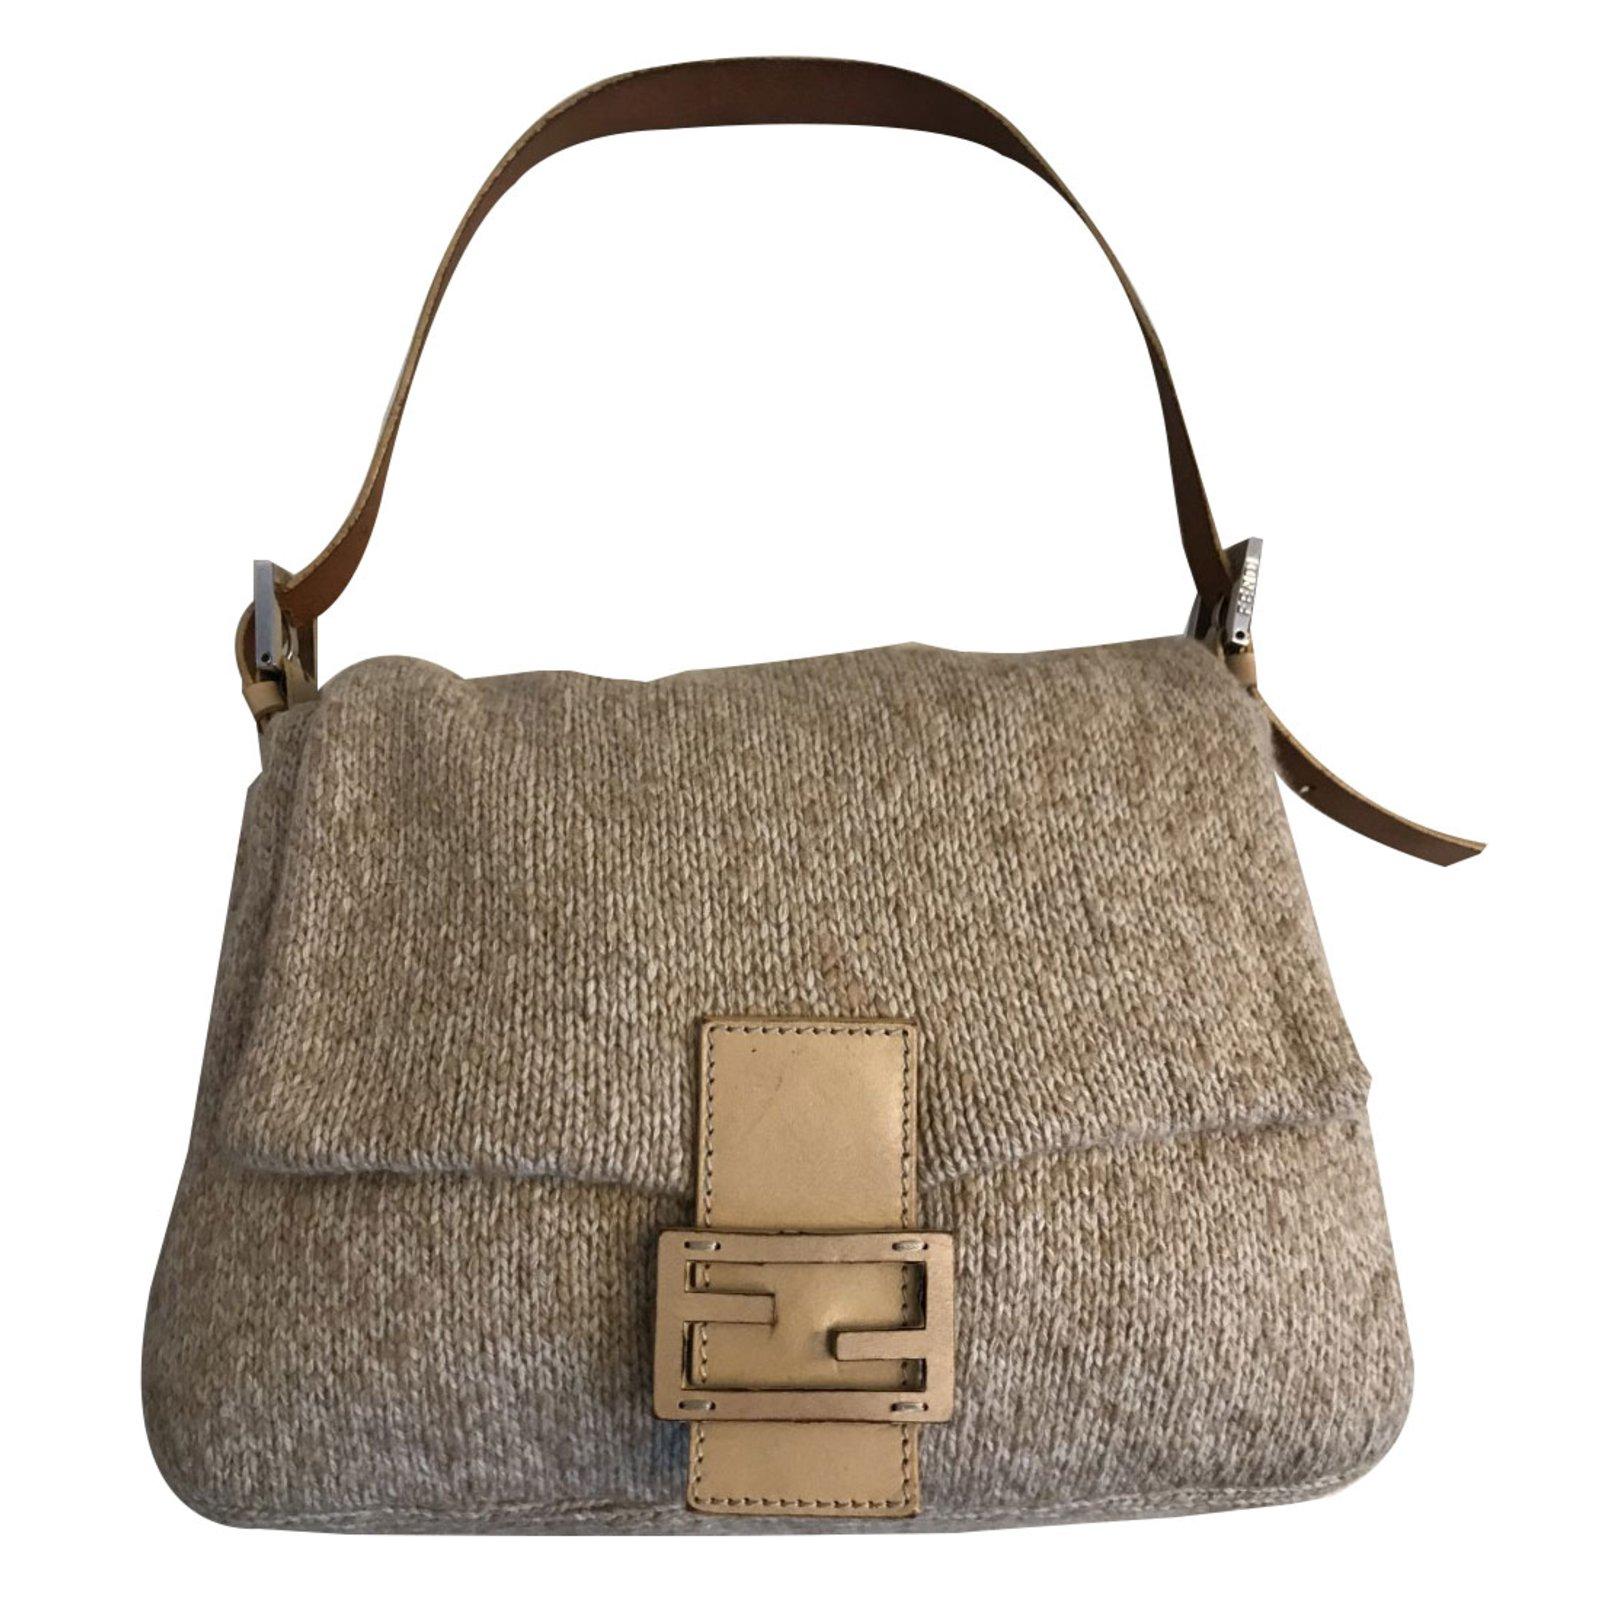 a4e951fdf1bb Fendi Baguette Handbags Other